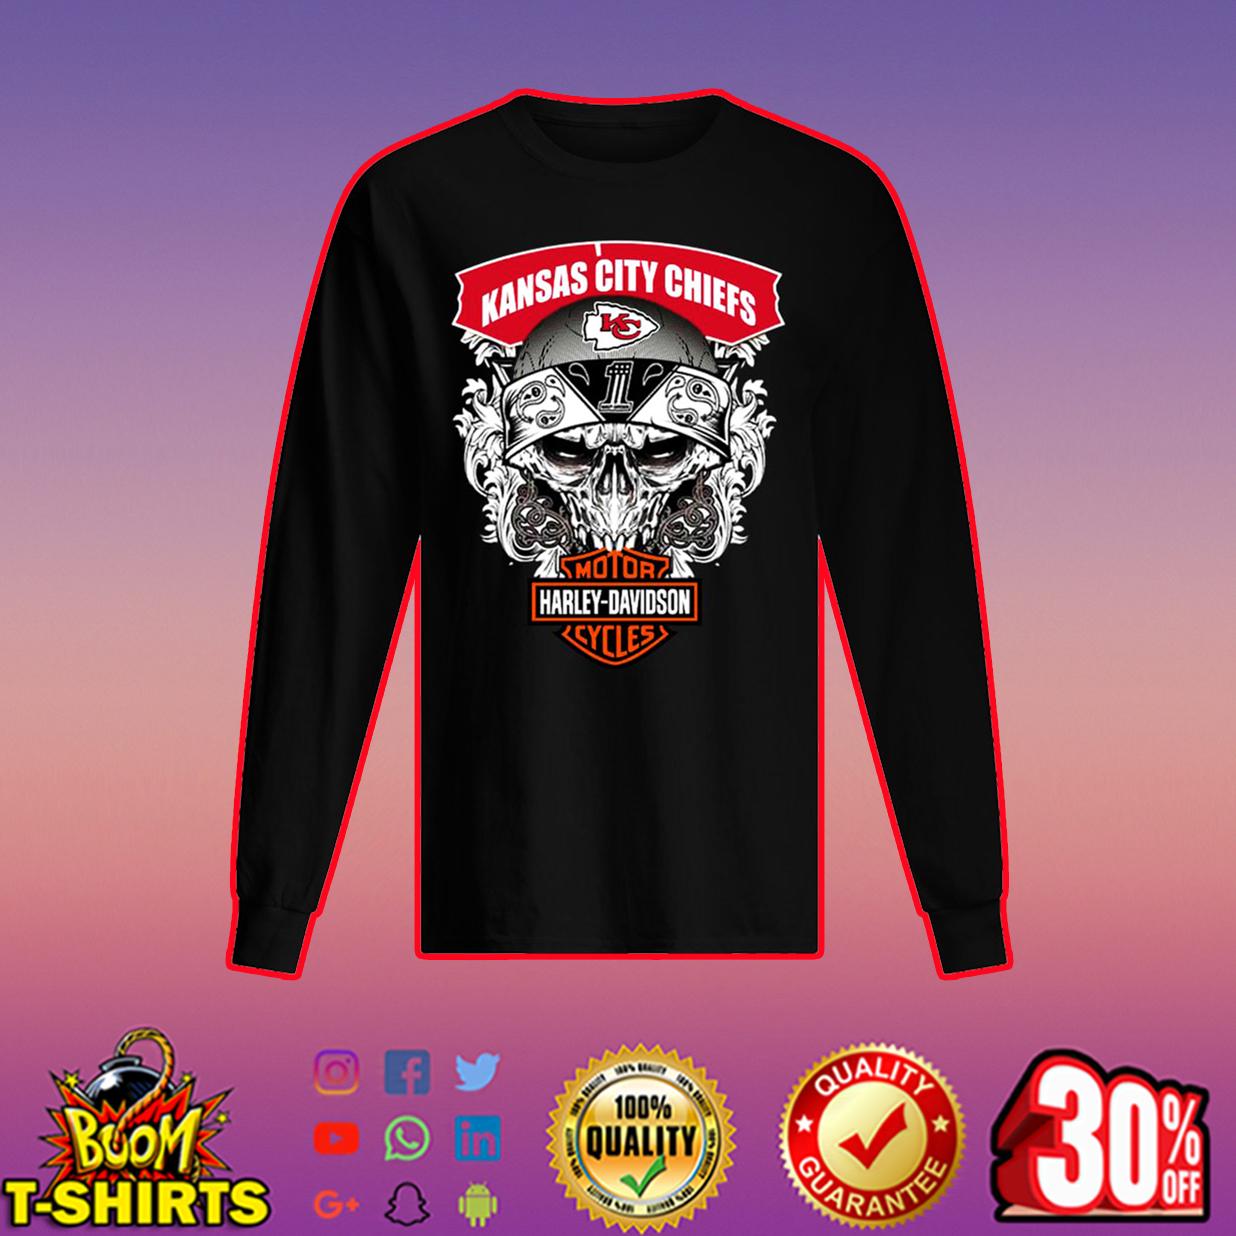 Kansas City Chiefs Motor Harley Davidson long sleeved t-shirt